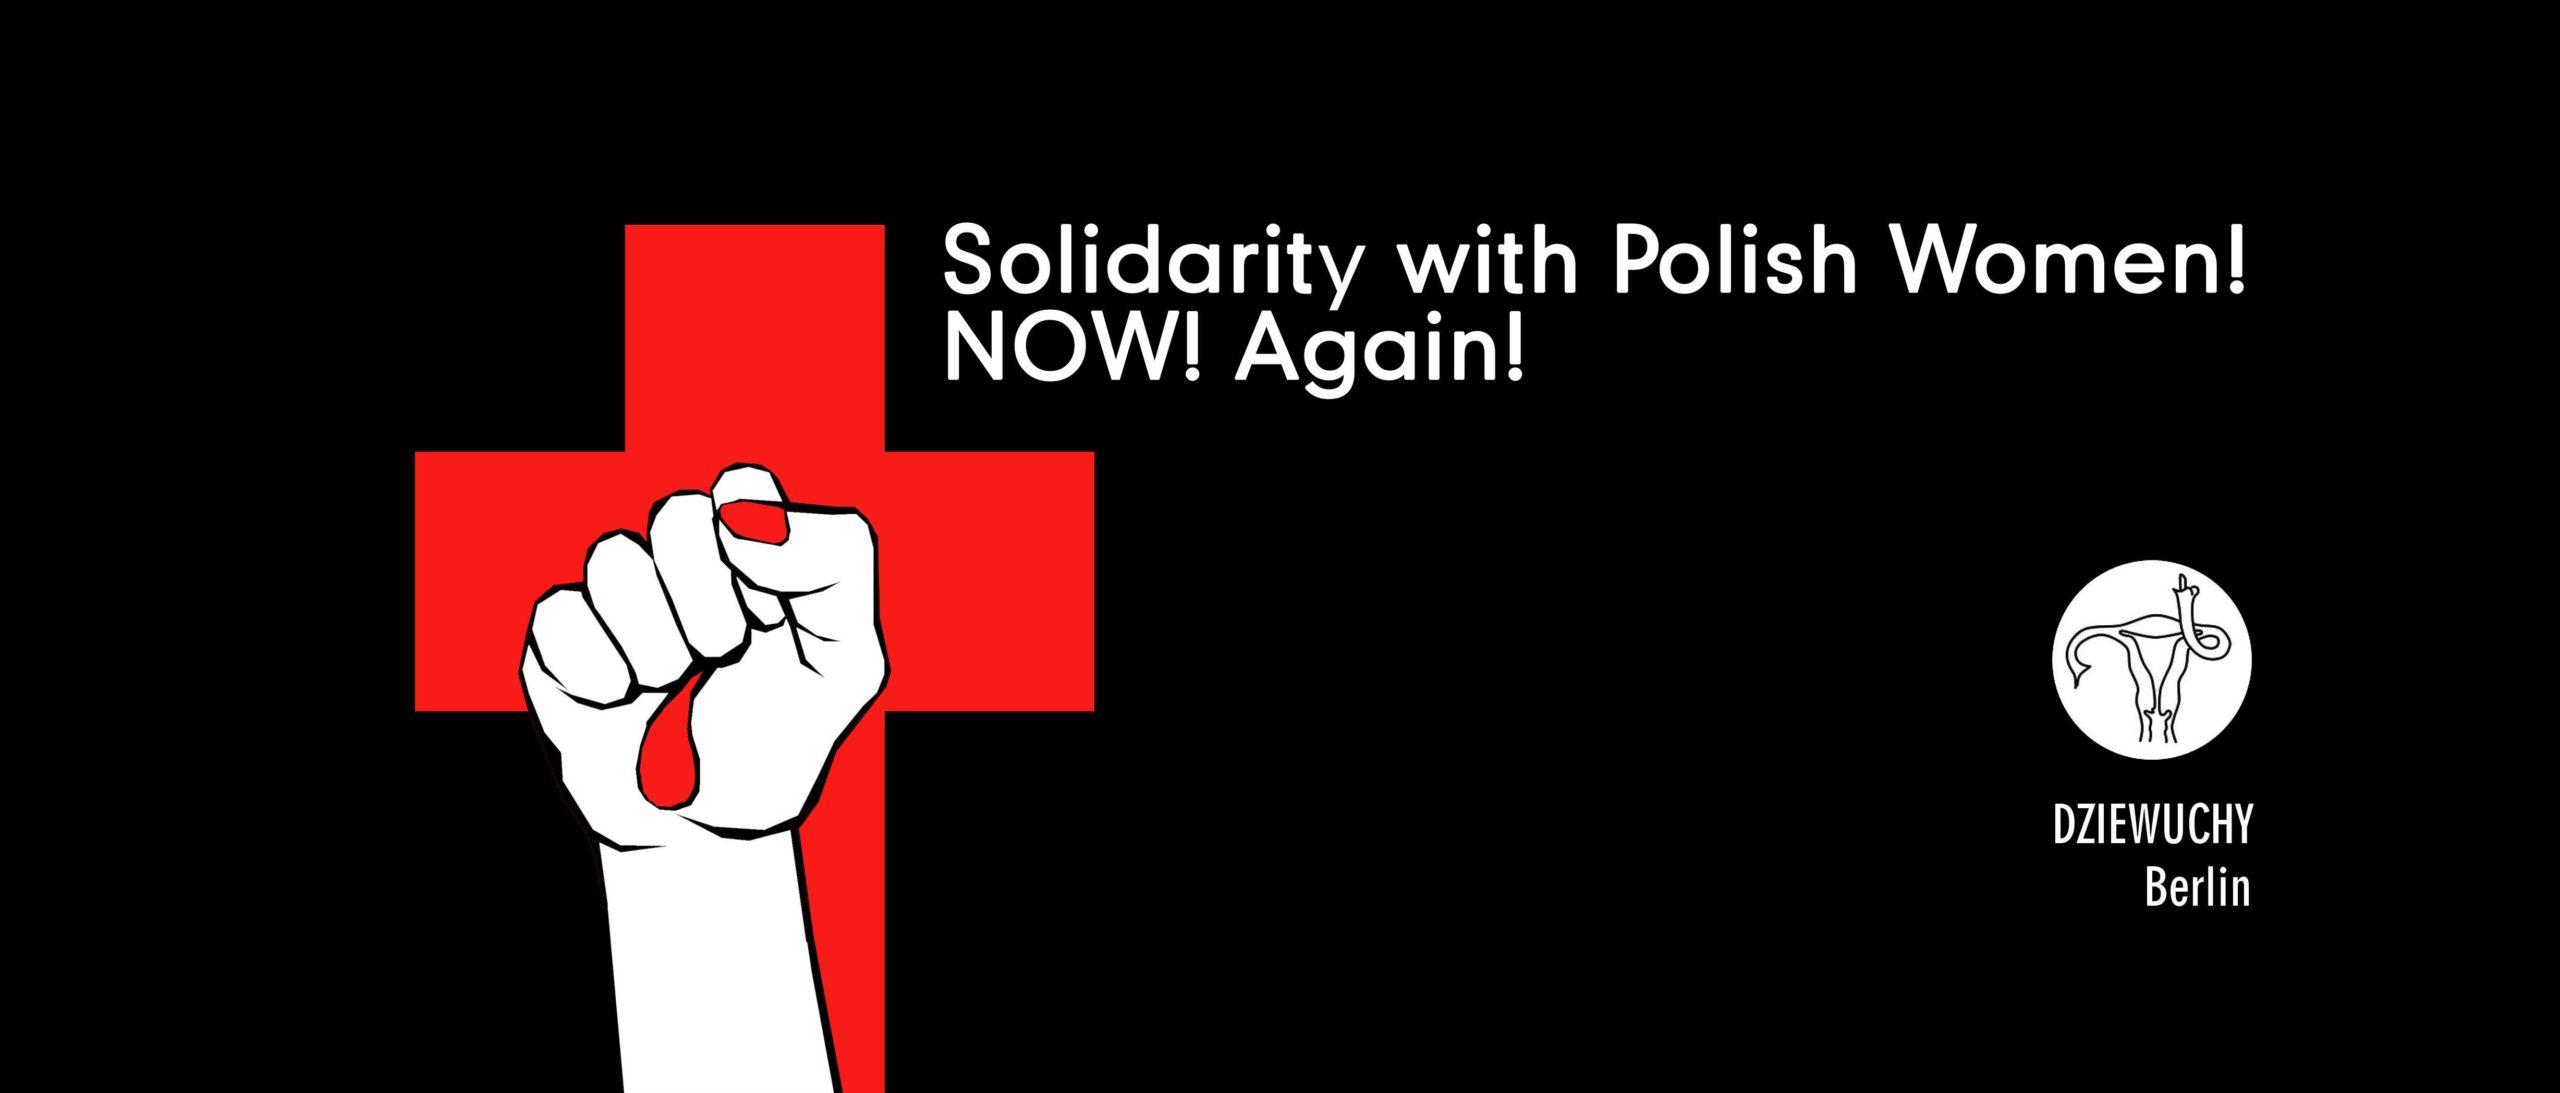 Poland threatened by abortion ban, again!